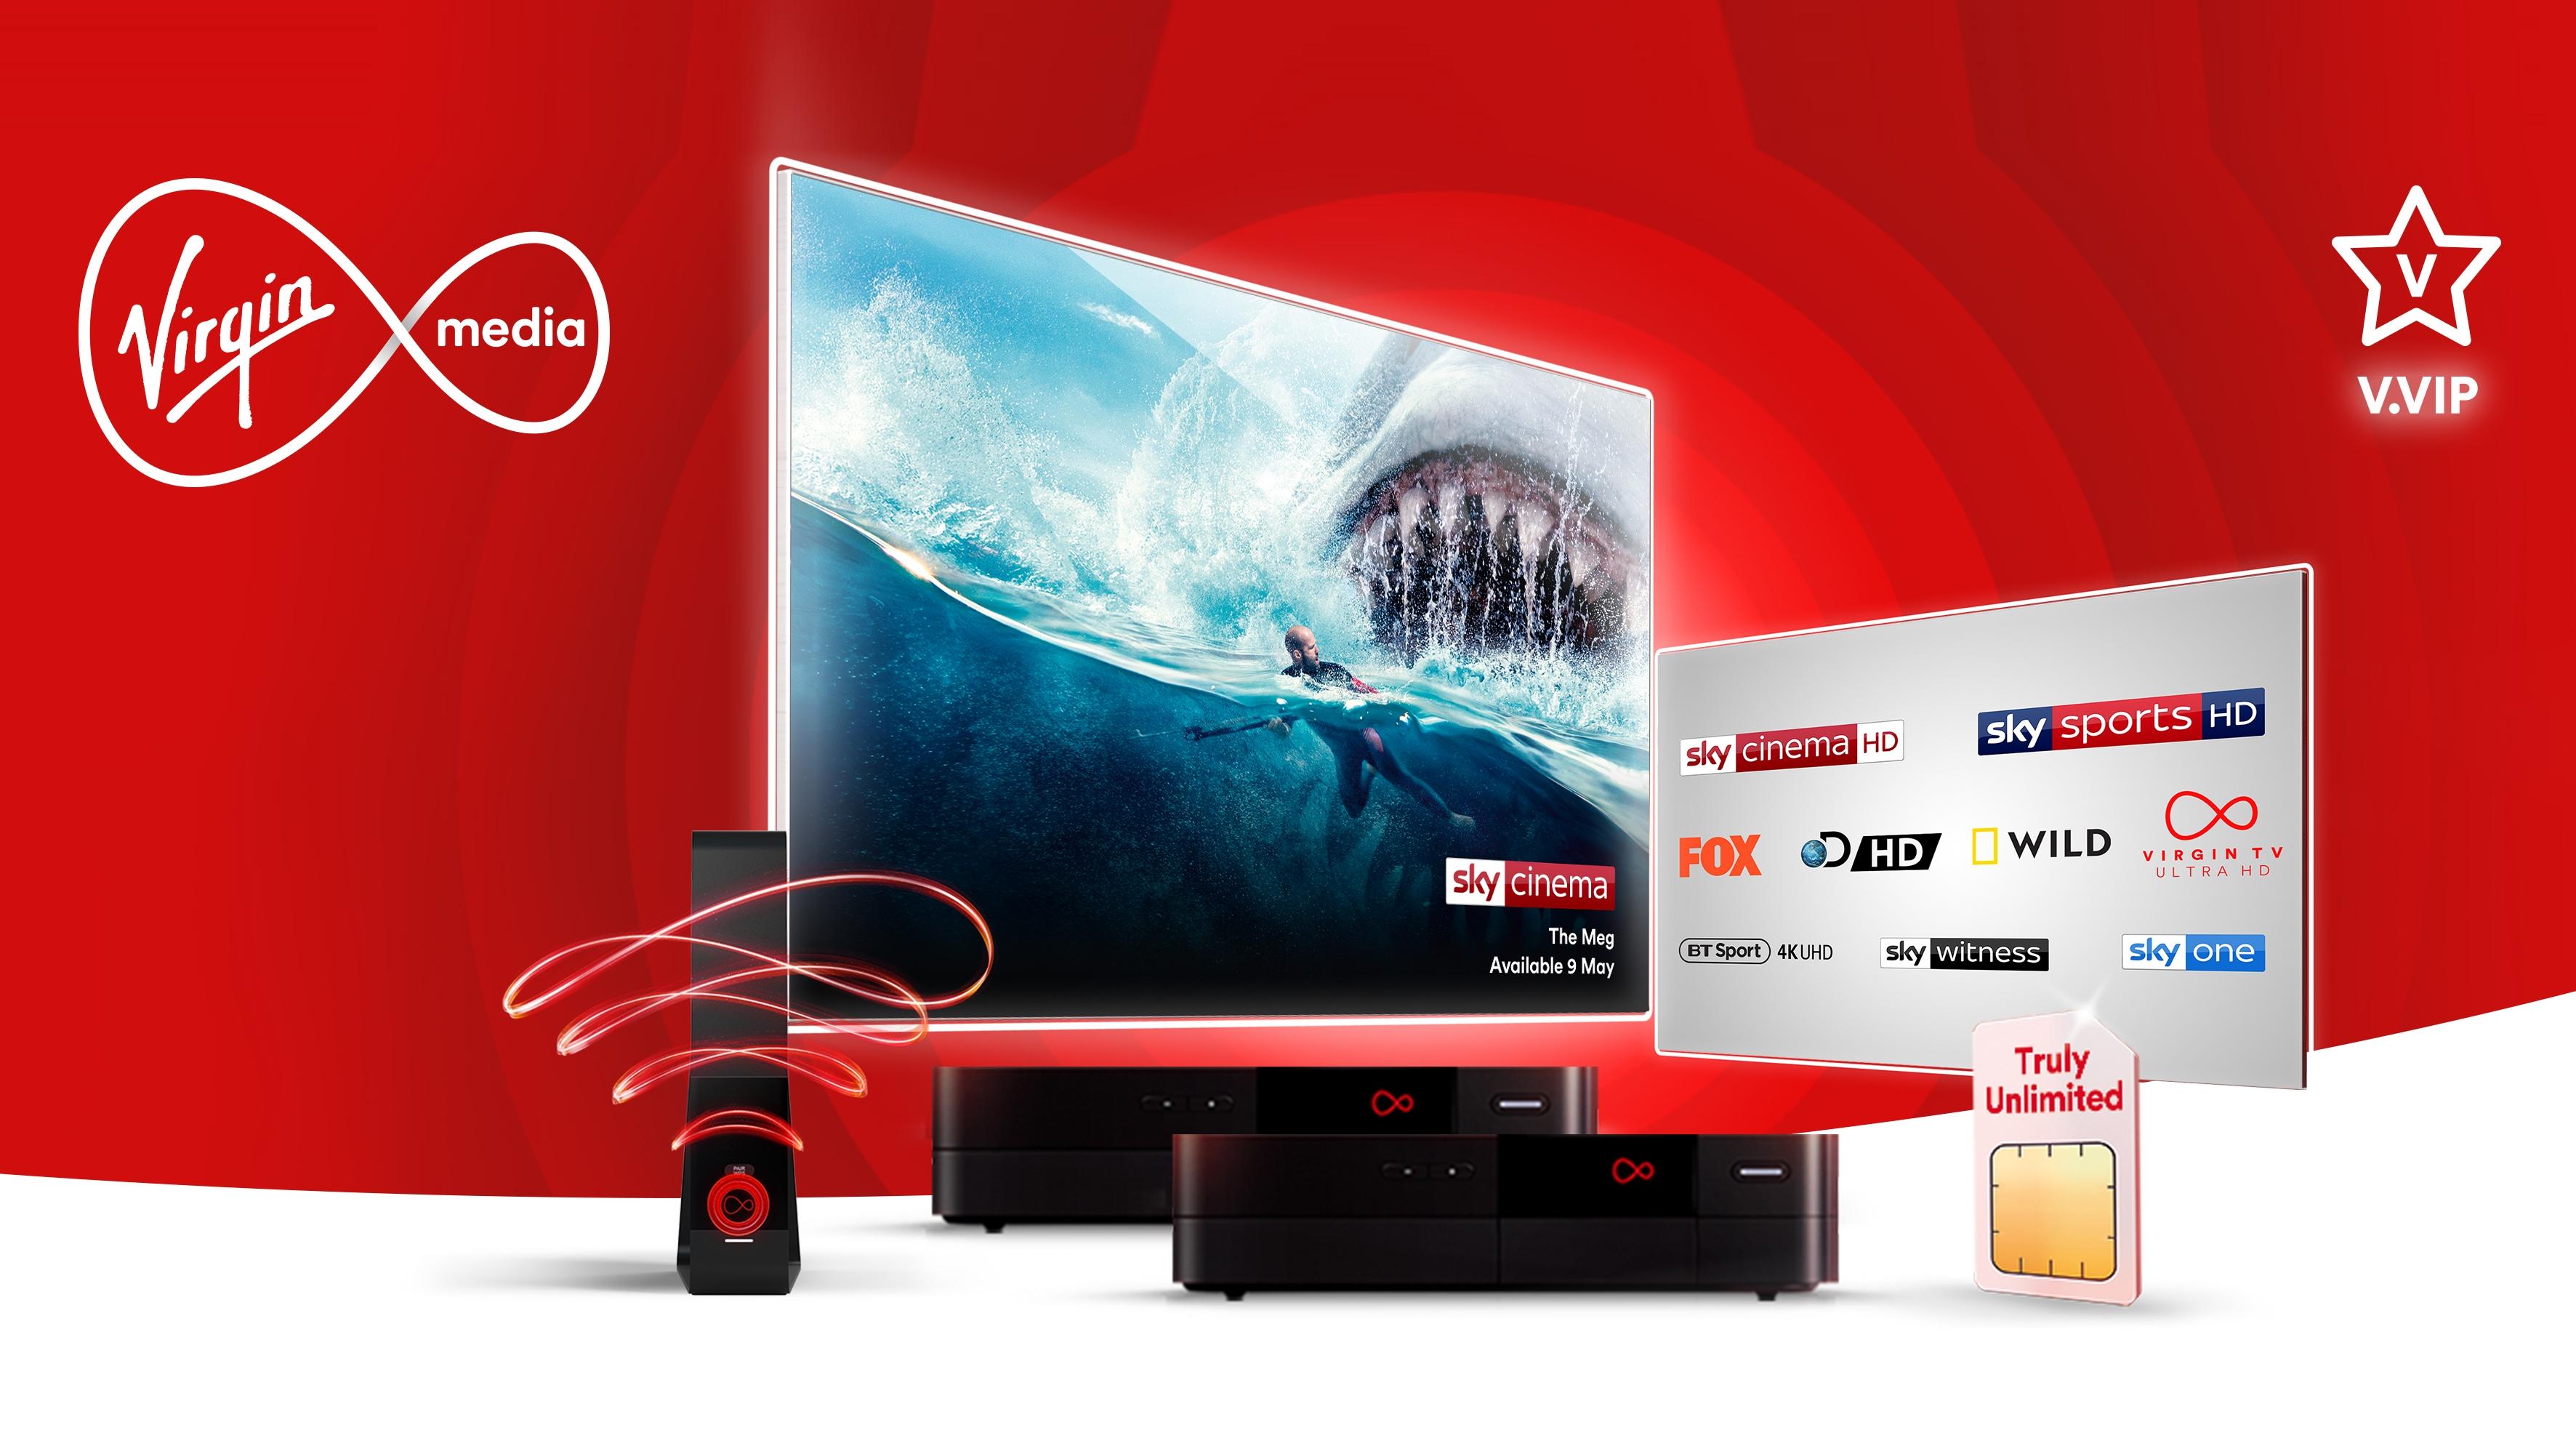 Uwm7h78Mf2fh4gHimWfUEN - Virgin Media set to supercharge UK broadband speeds